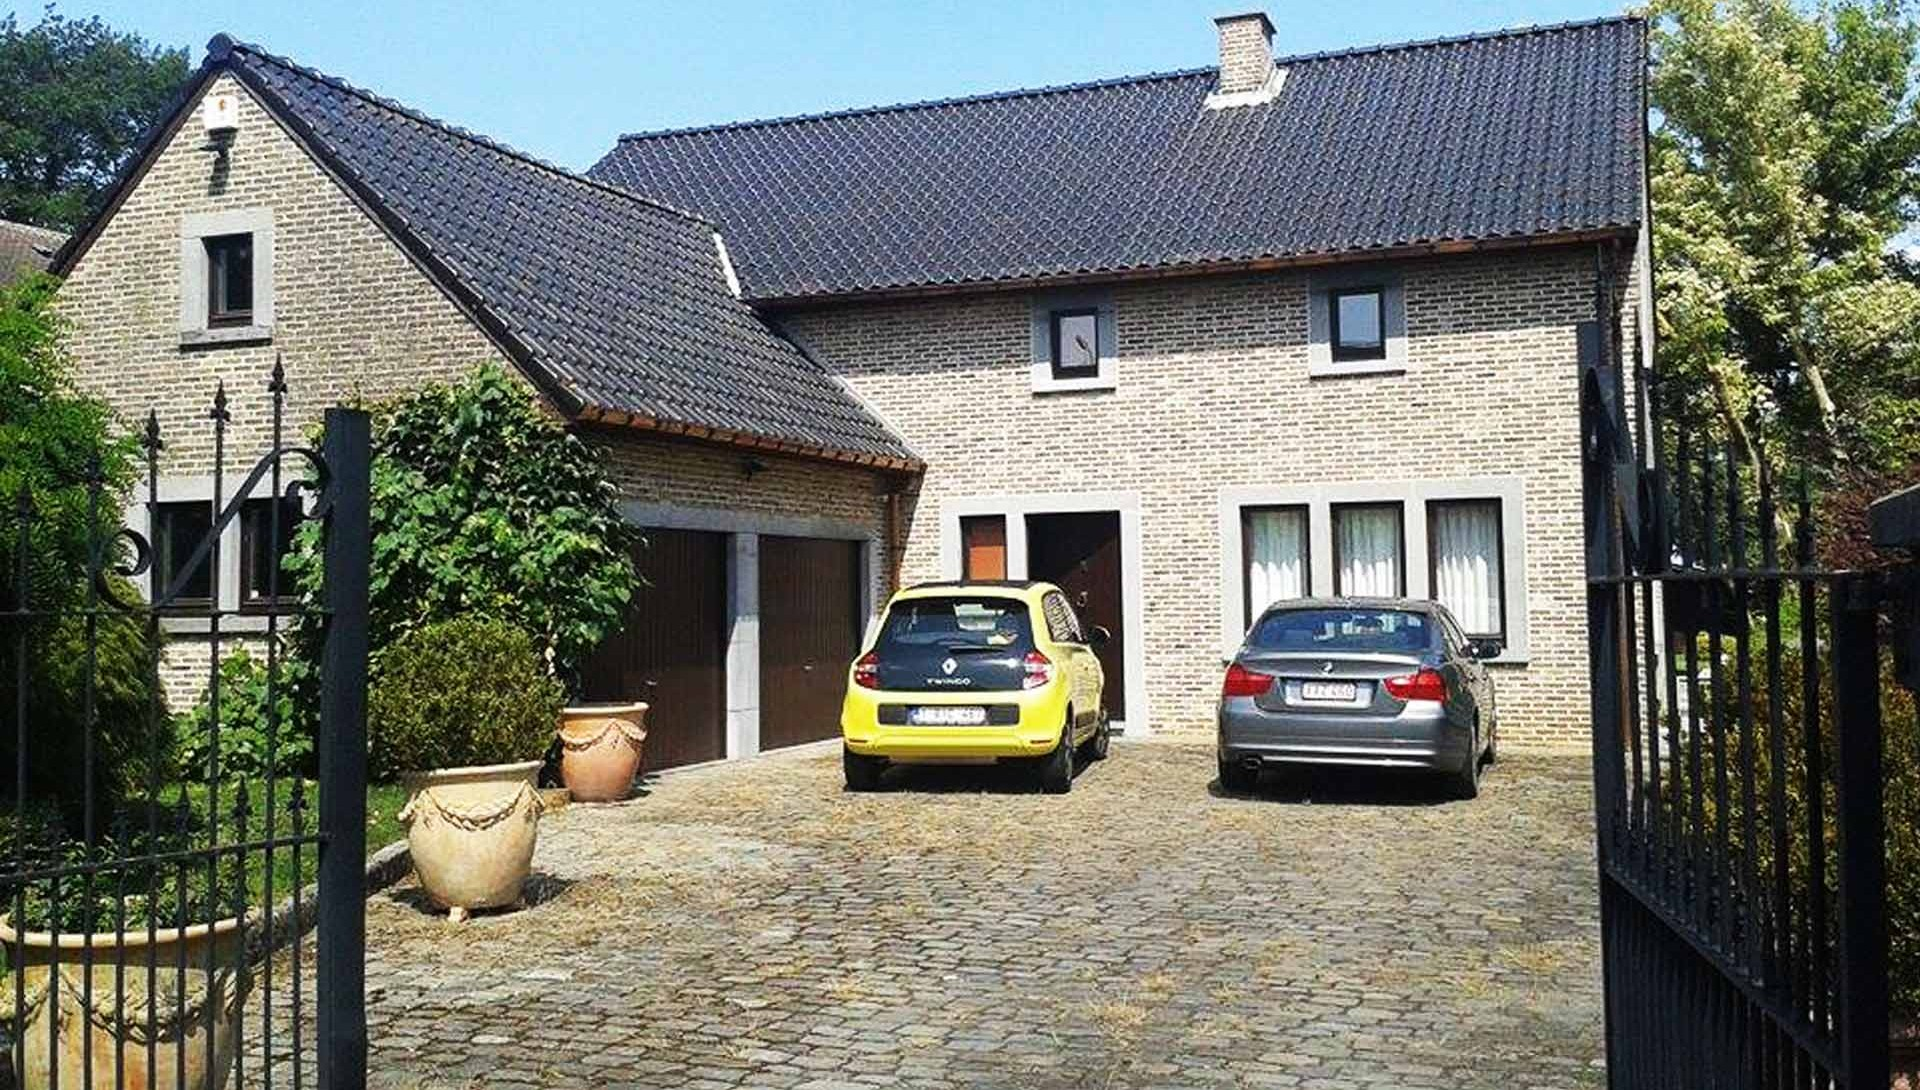 Hd wallpapers vente maison moderne belgique android